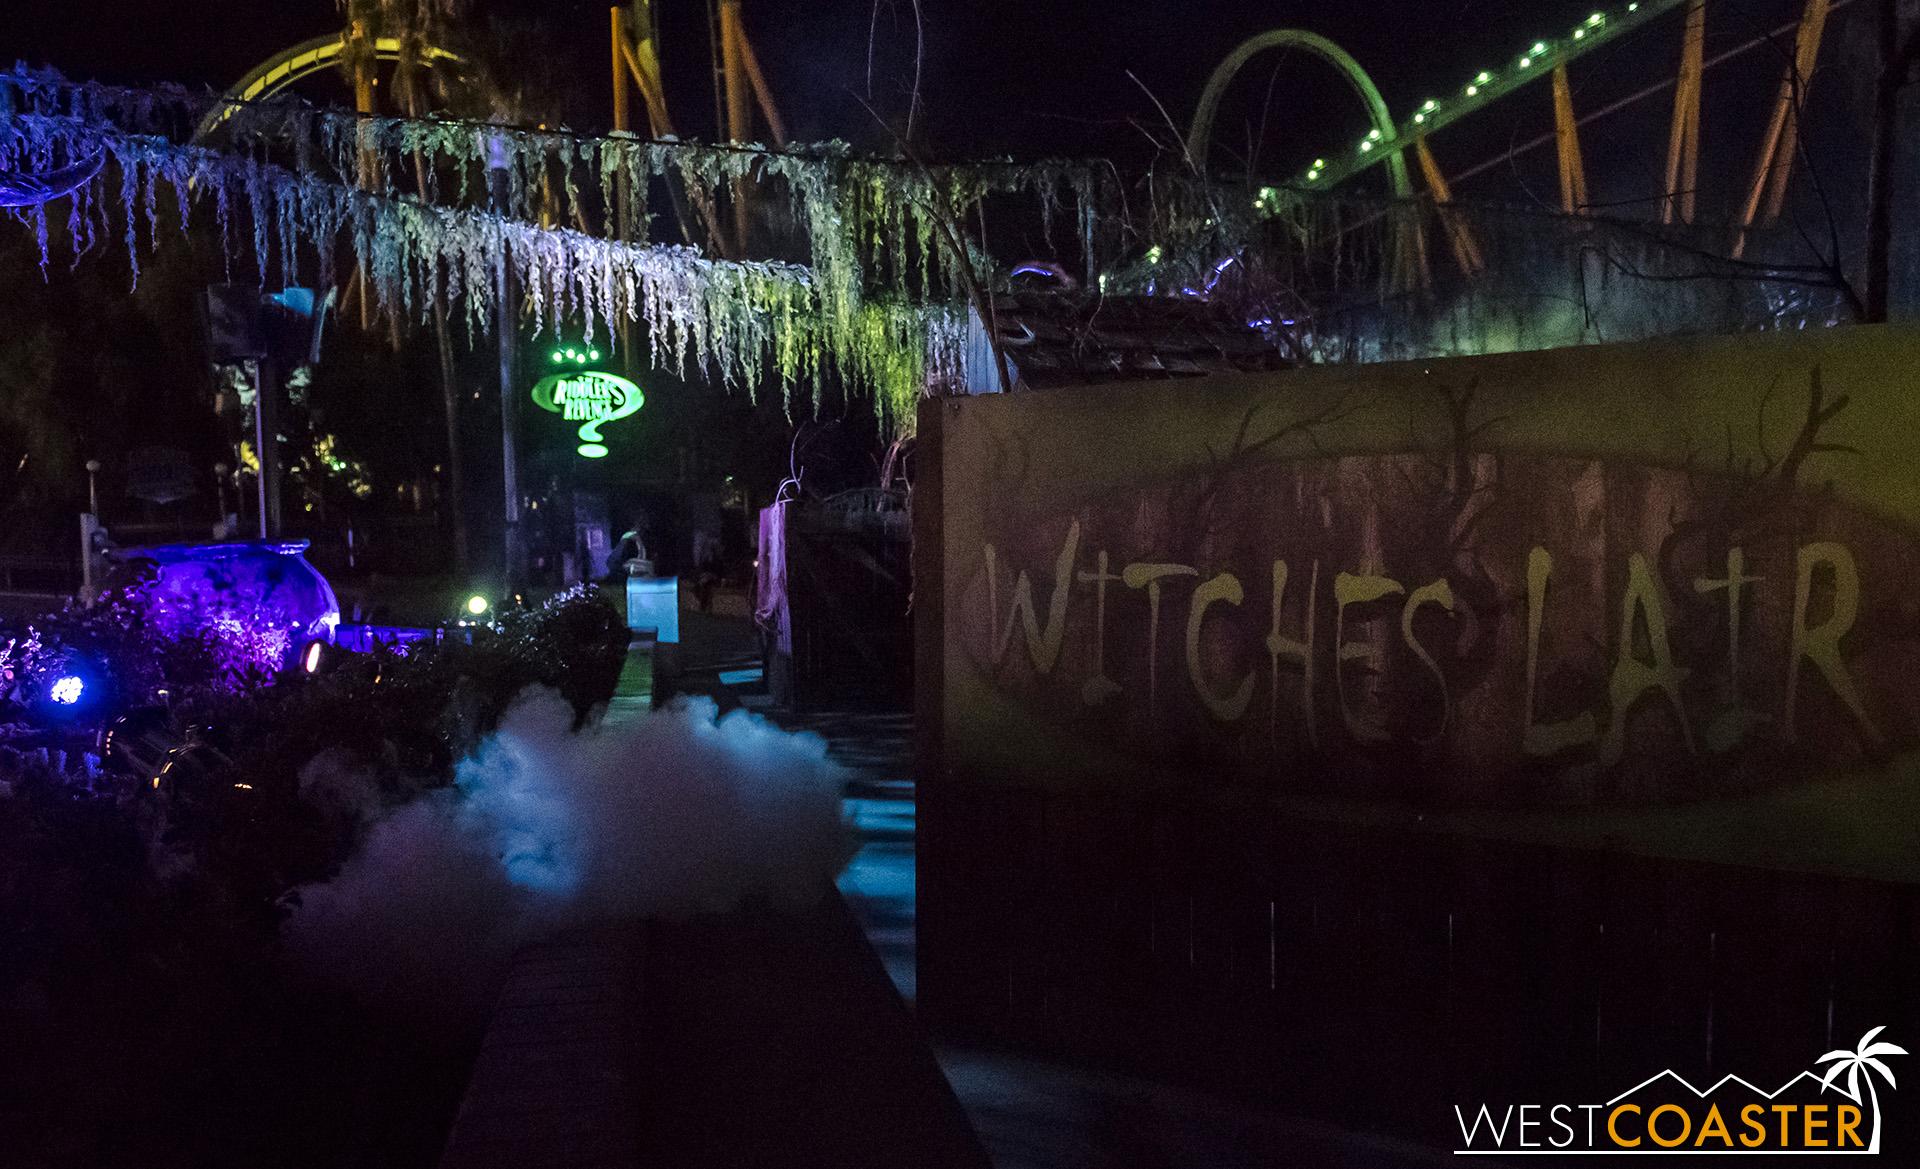 SFMMFF-18_0920-E-WitchesLair-0002.jpg